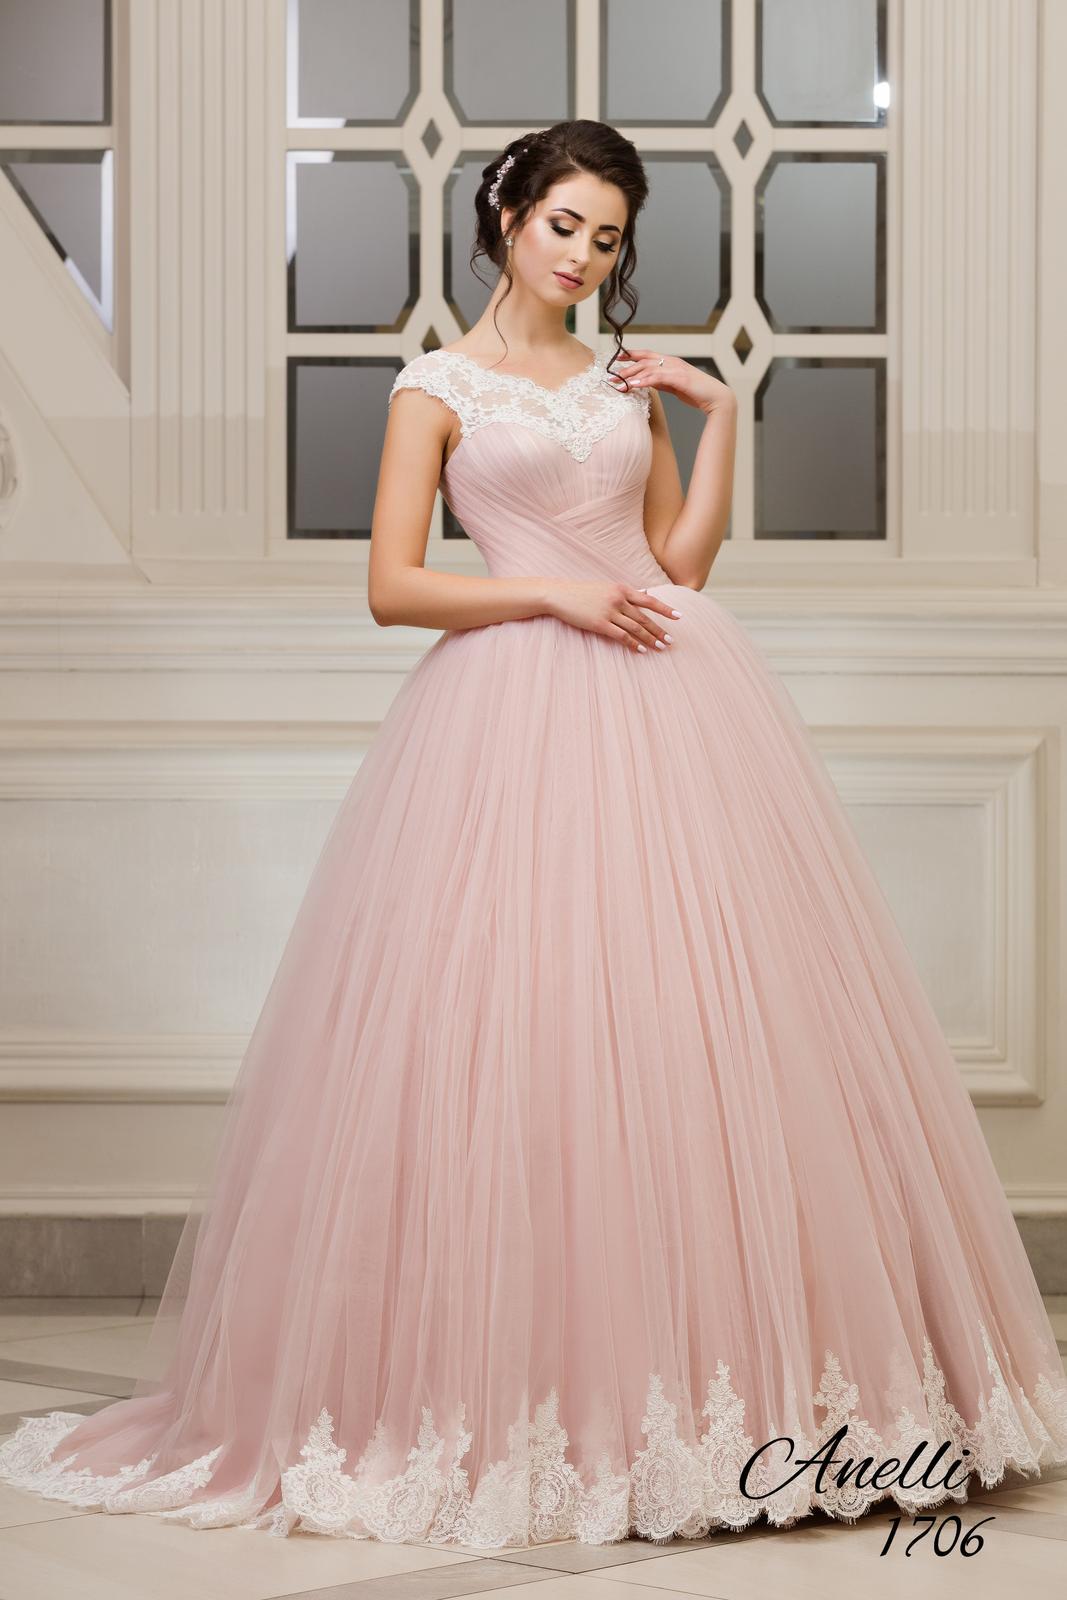 Svadobné šaty - Debut 1706 - Obrázok č. 1